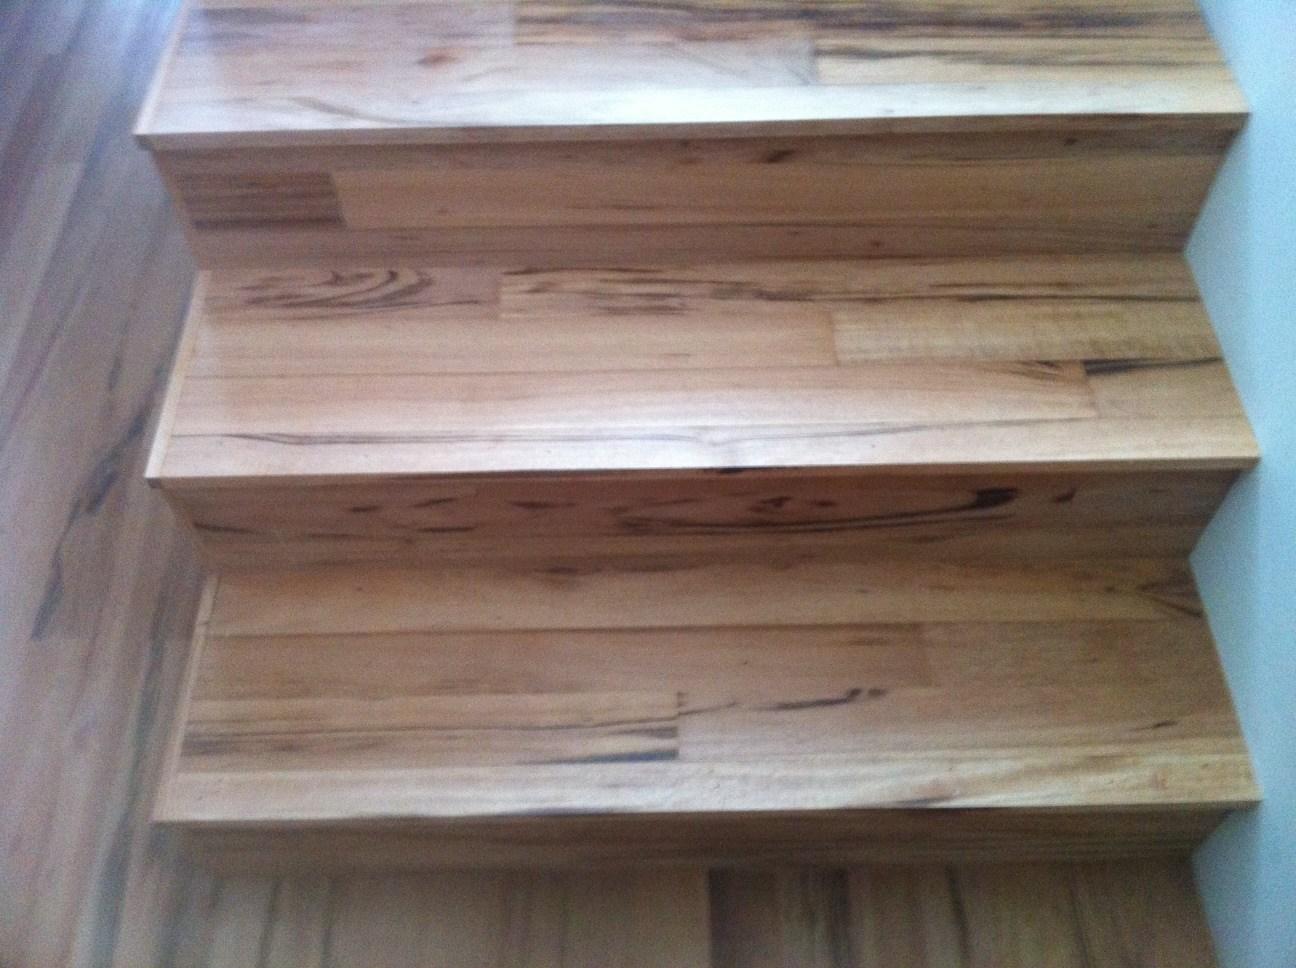 Stair Treads Using Flooring Stair Parts Blog   Hardwood Floor Stair Treads   Dark Oak   Hickory   Vinyl   Red Oak   Pergo Floor